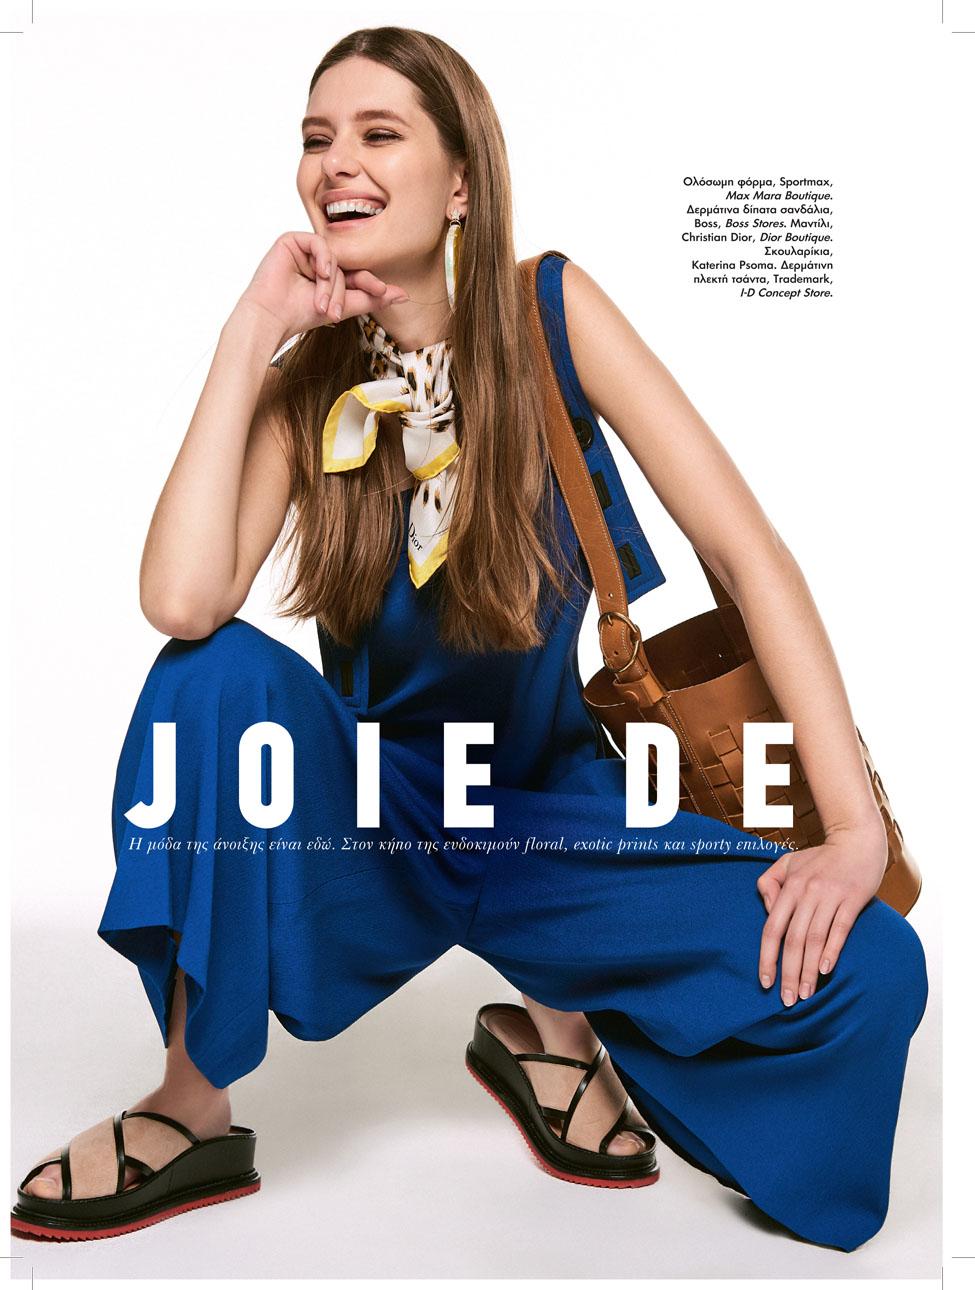 Anna has found her joie de vivre for Elle Mag.